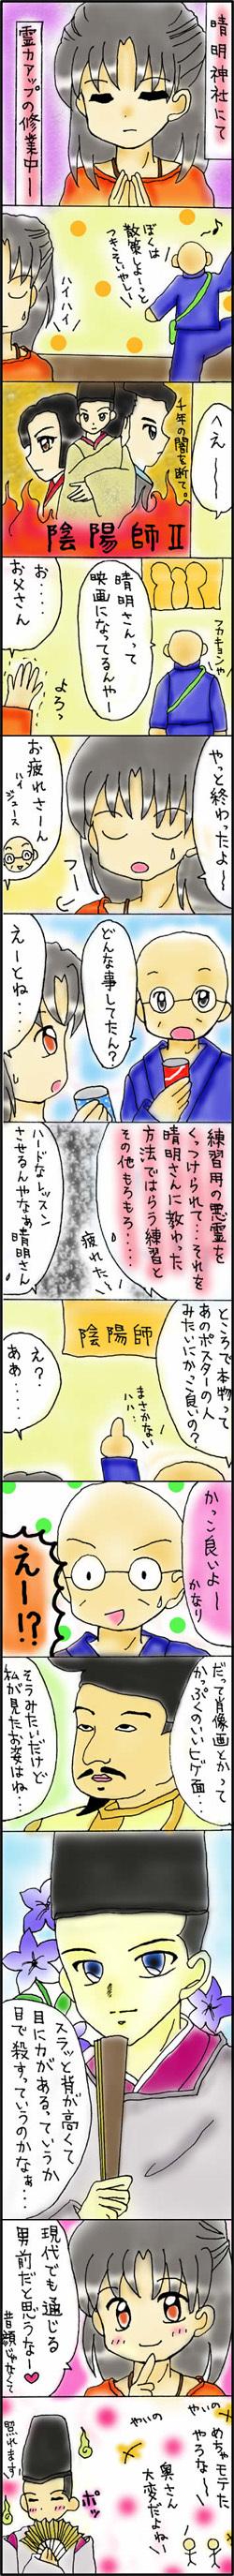 2019_08_31_hime03.jpg